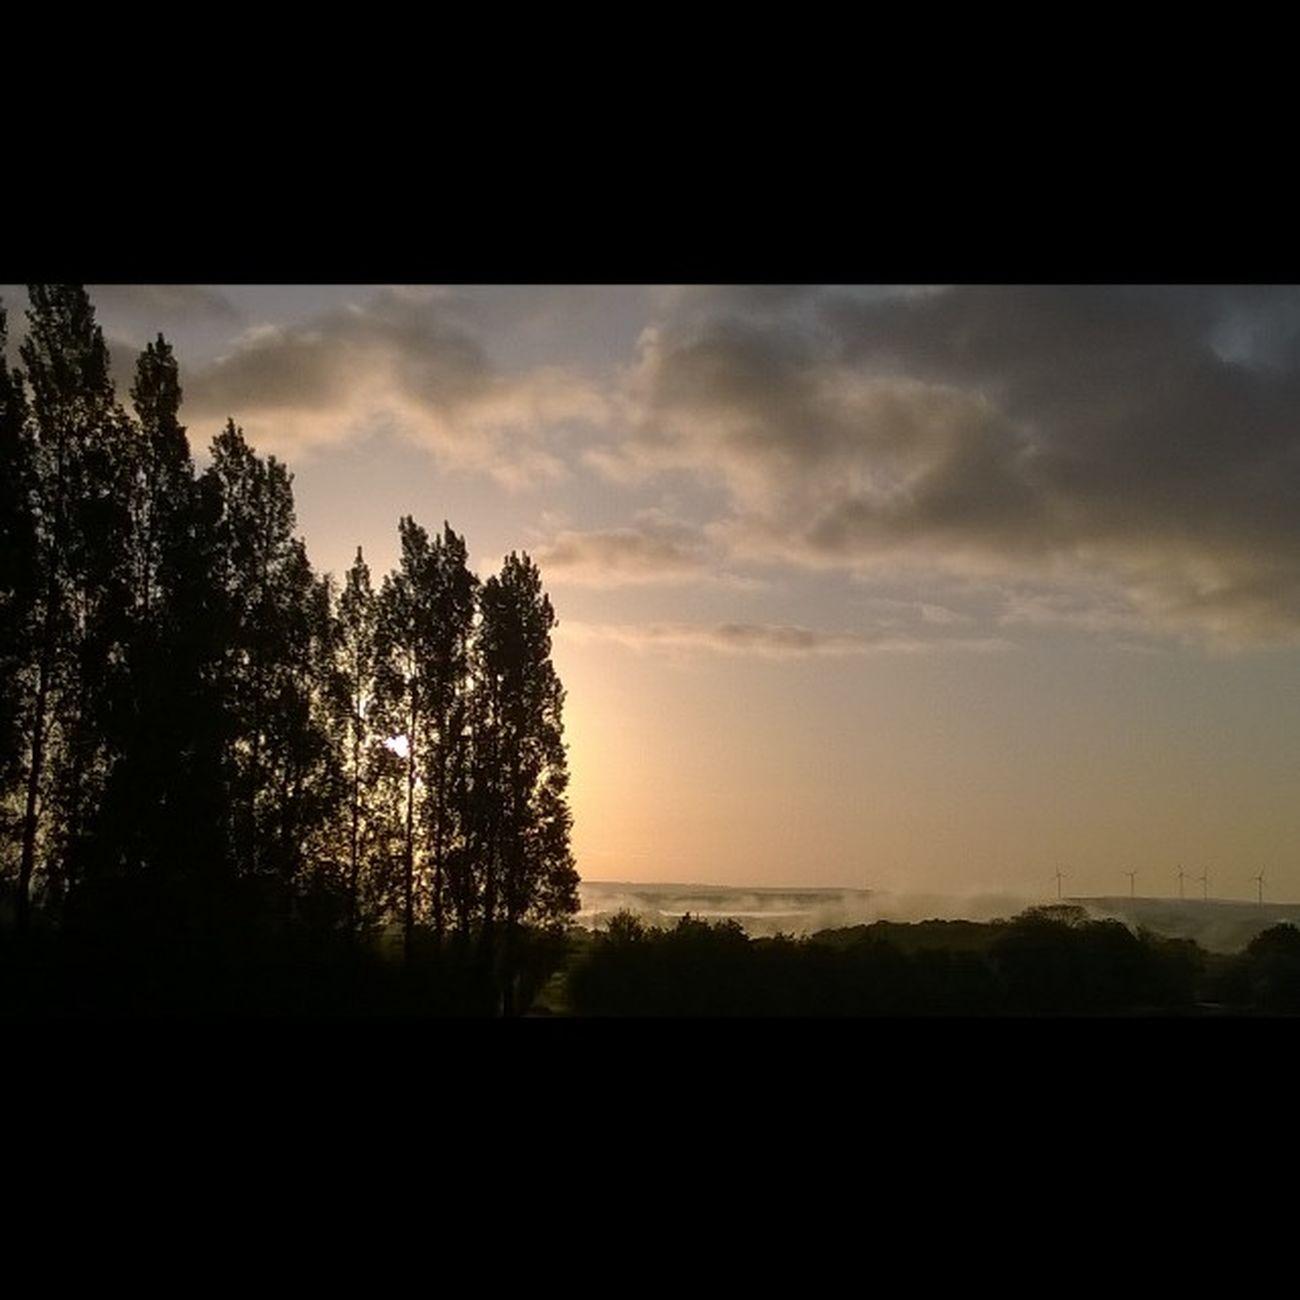 Leverdesoleil avec Brouillard et Nuages Sunrise with Fog and Clouds Sun Soleil Countryside Campagne Taupont Morbihan Miamorbihan Bretagne Breizh Jaimelabretagne Bretagnetourisme Nature Naturelovers Nofilter Instagram Instagramers Trees Arbres Arboles alberi sol sole amanecer